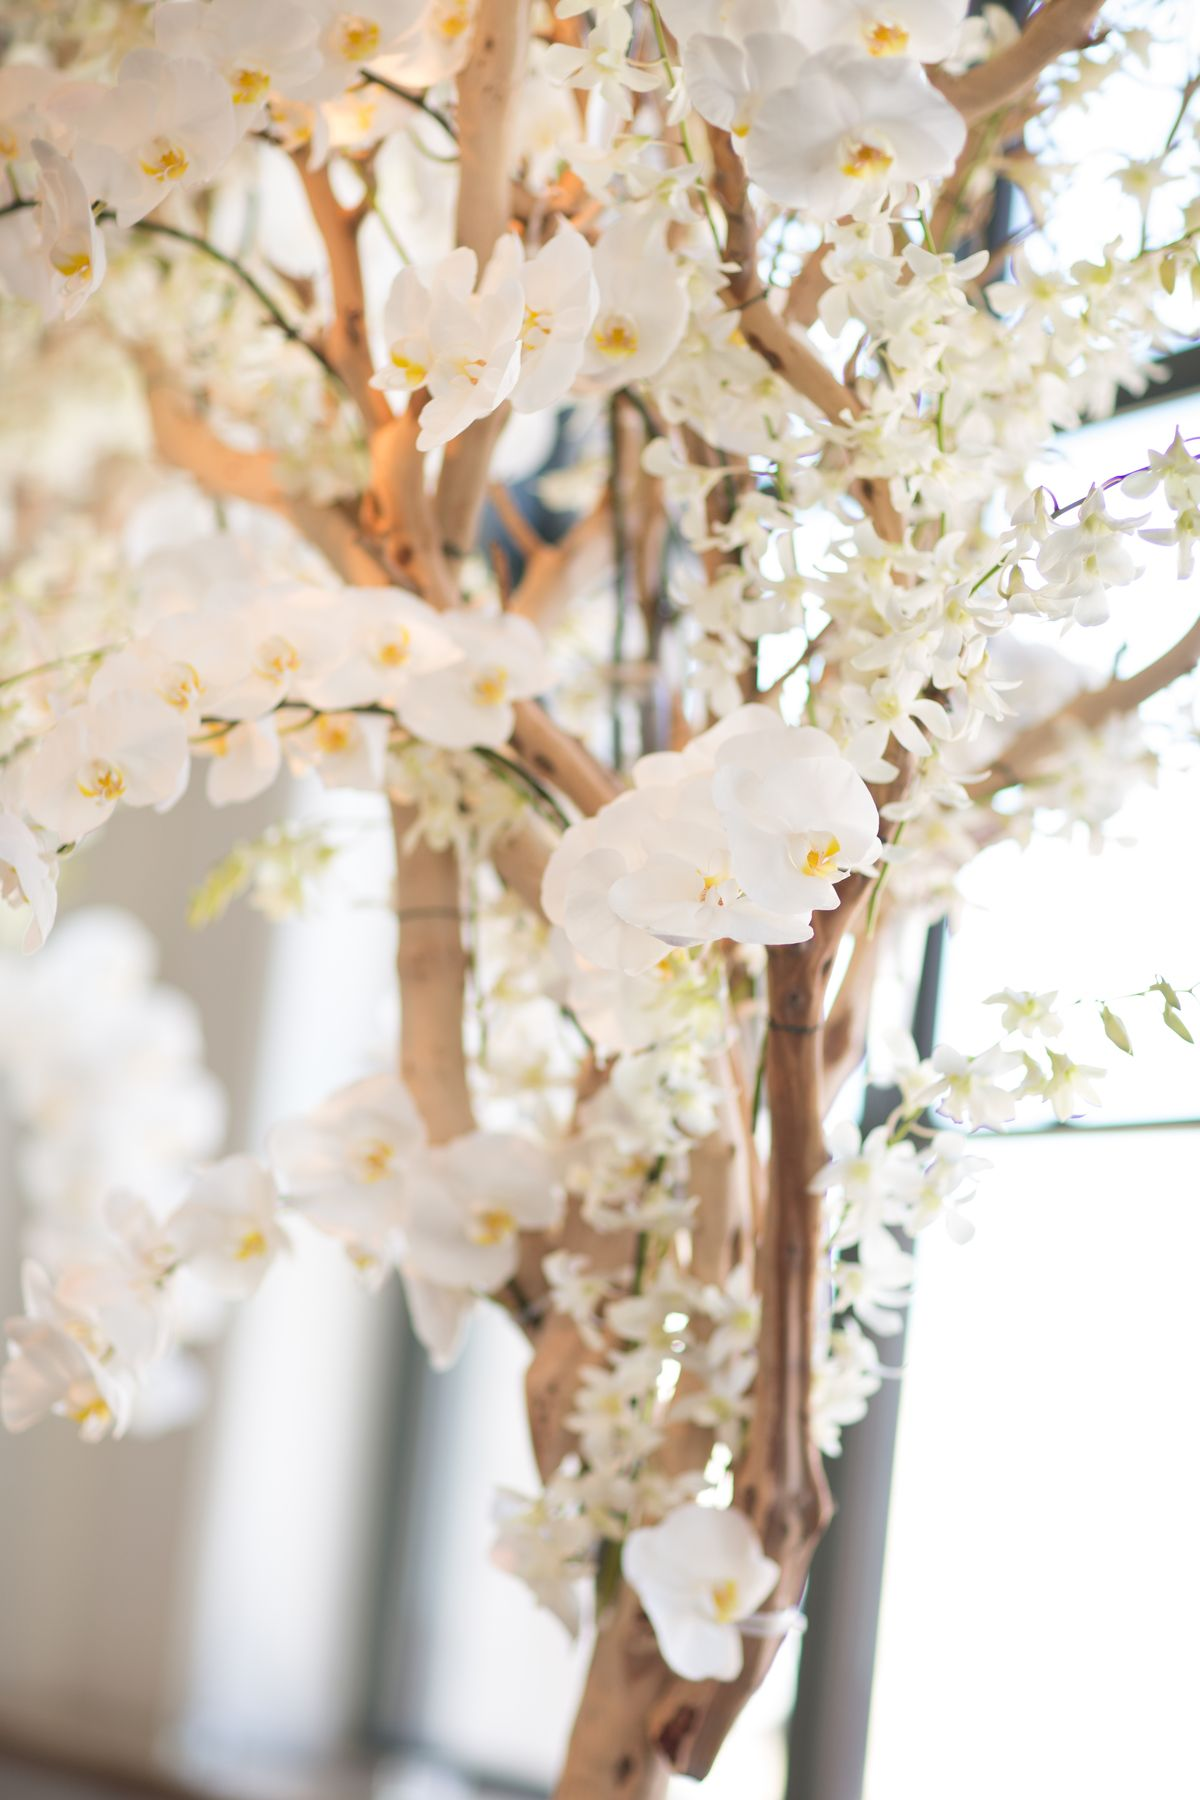 Unique Decor Ideas Using Orchid Wedding Flowers | by Bride & Blossom ...